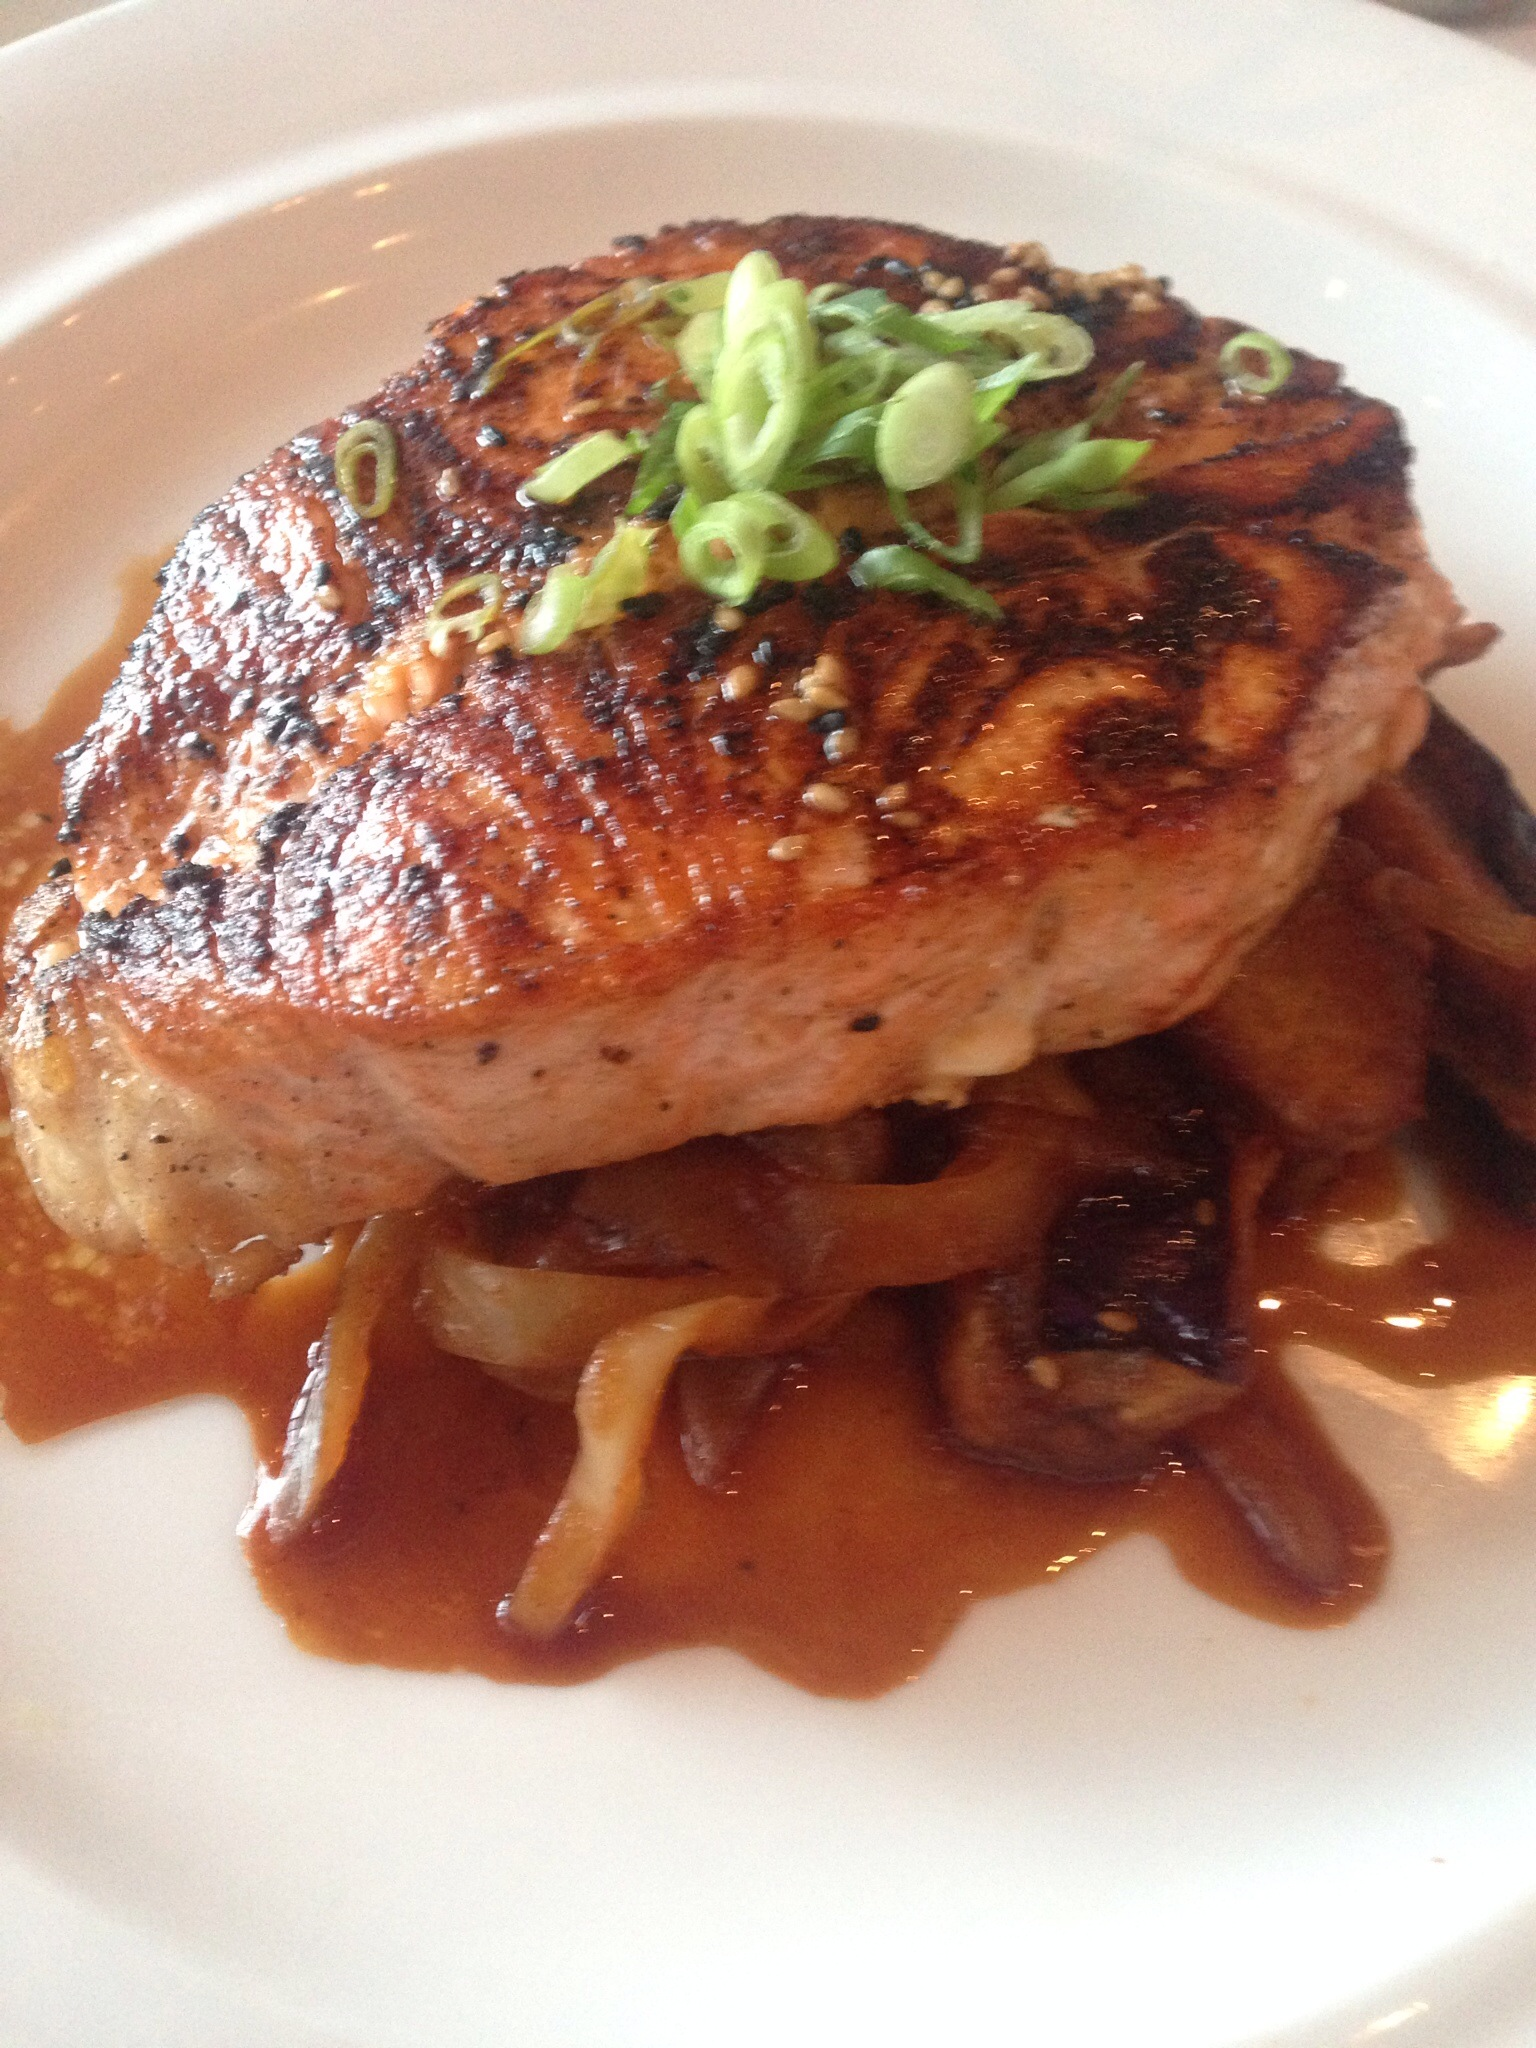 Restaurant week 2girlsindc for Passion fish reston menu